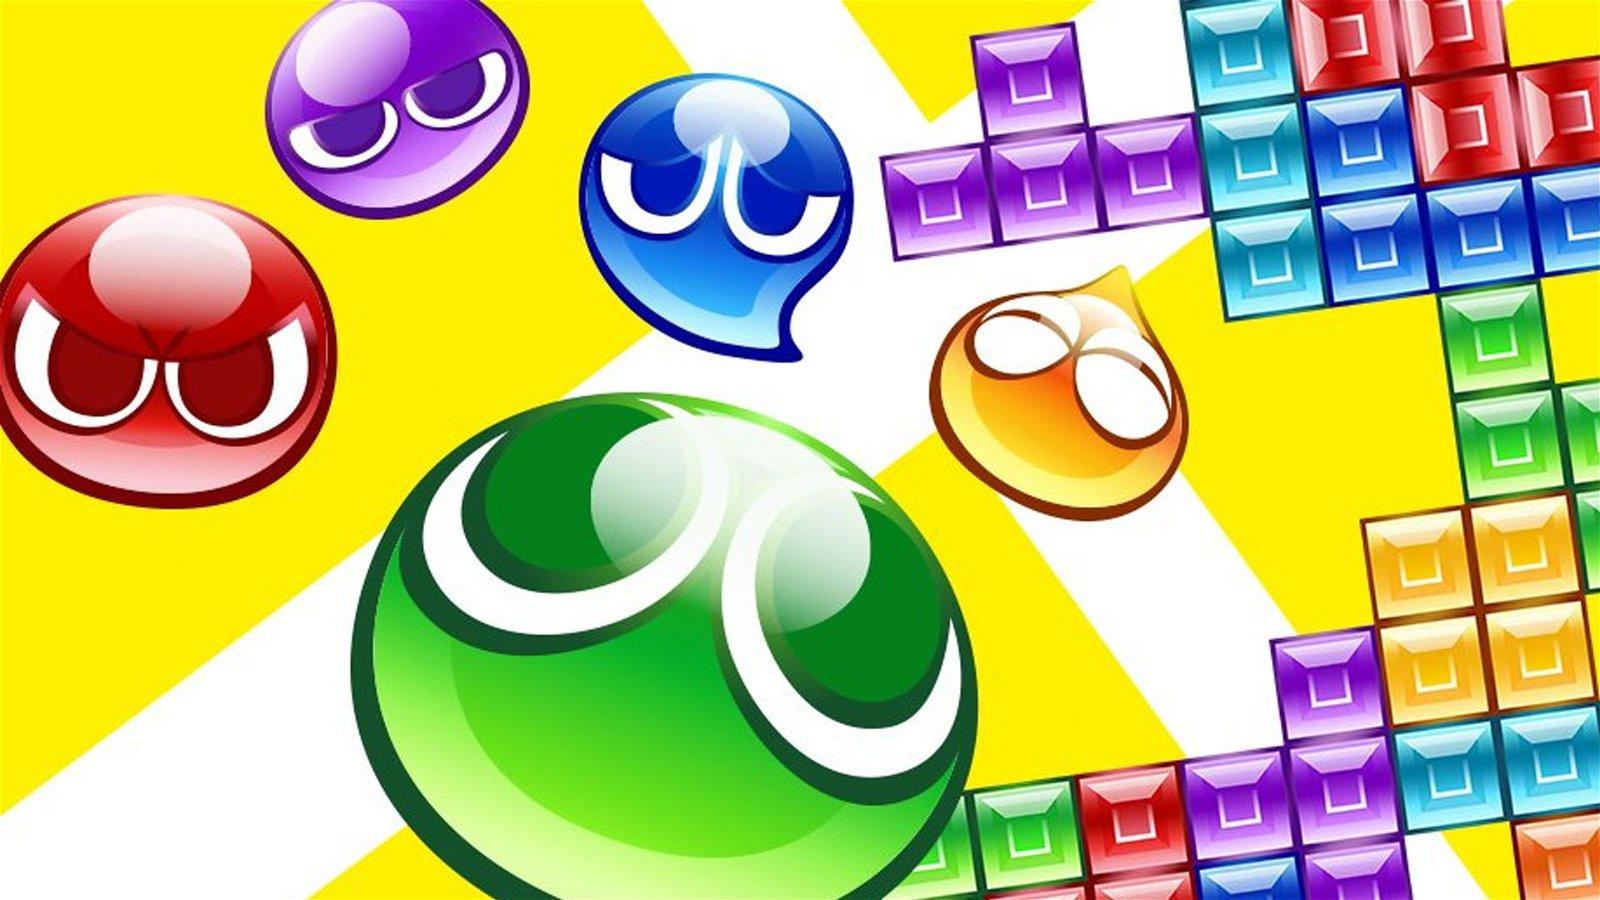 Puyo Puyo Tetris Review - Puzzle Greatness 4